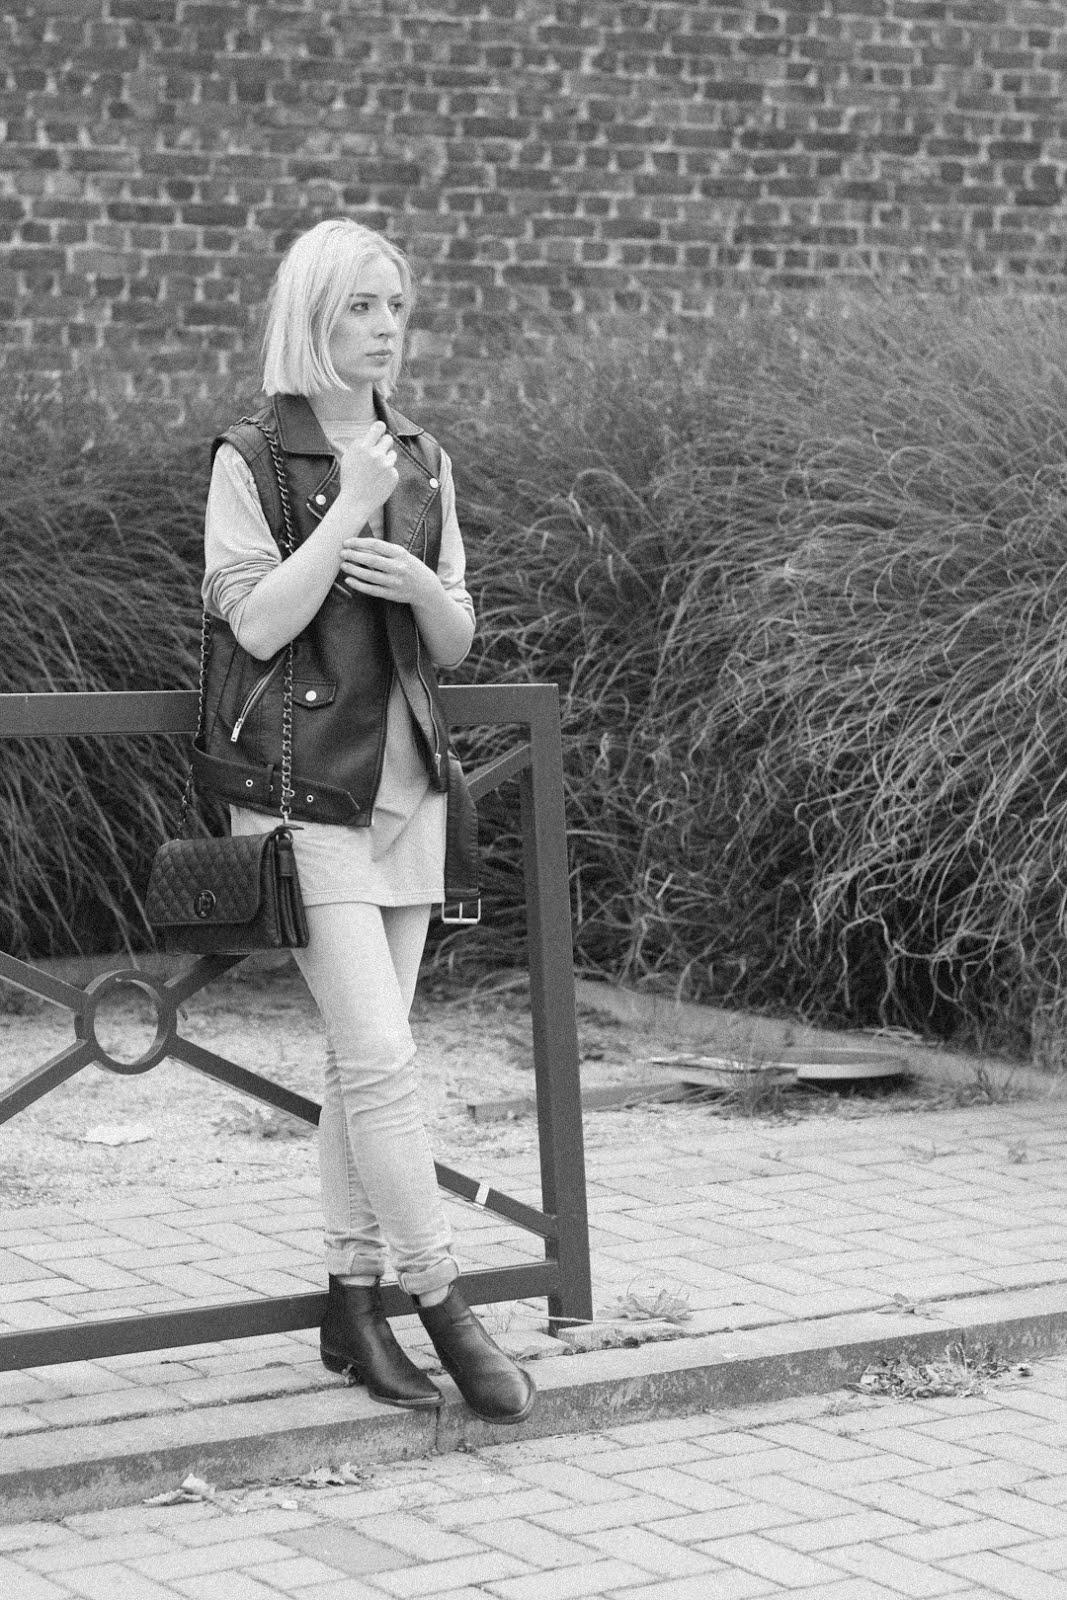 Biker waistcoat, jbc, grey jeans, marc b yaz bag, chanel inspired